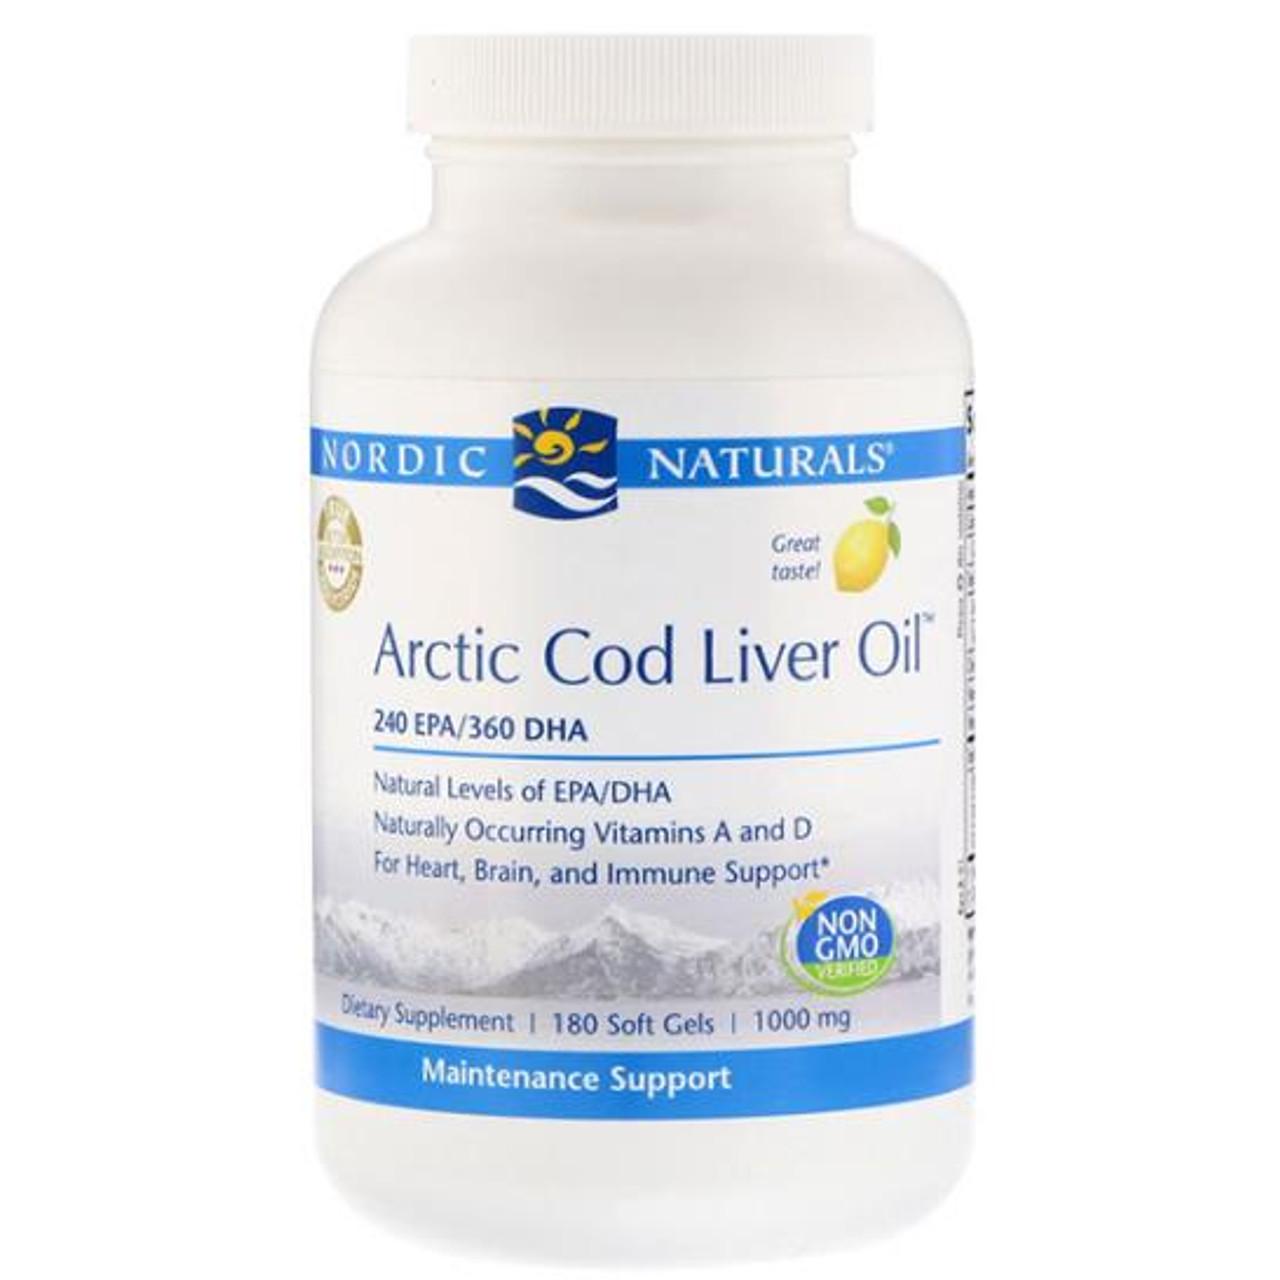 Arctic Cod Liver Oil (Lemon) 180 Soft Gels